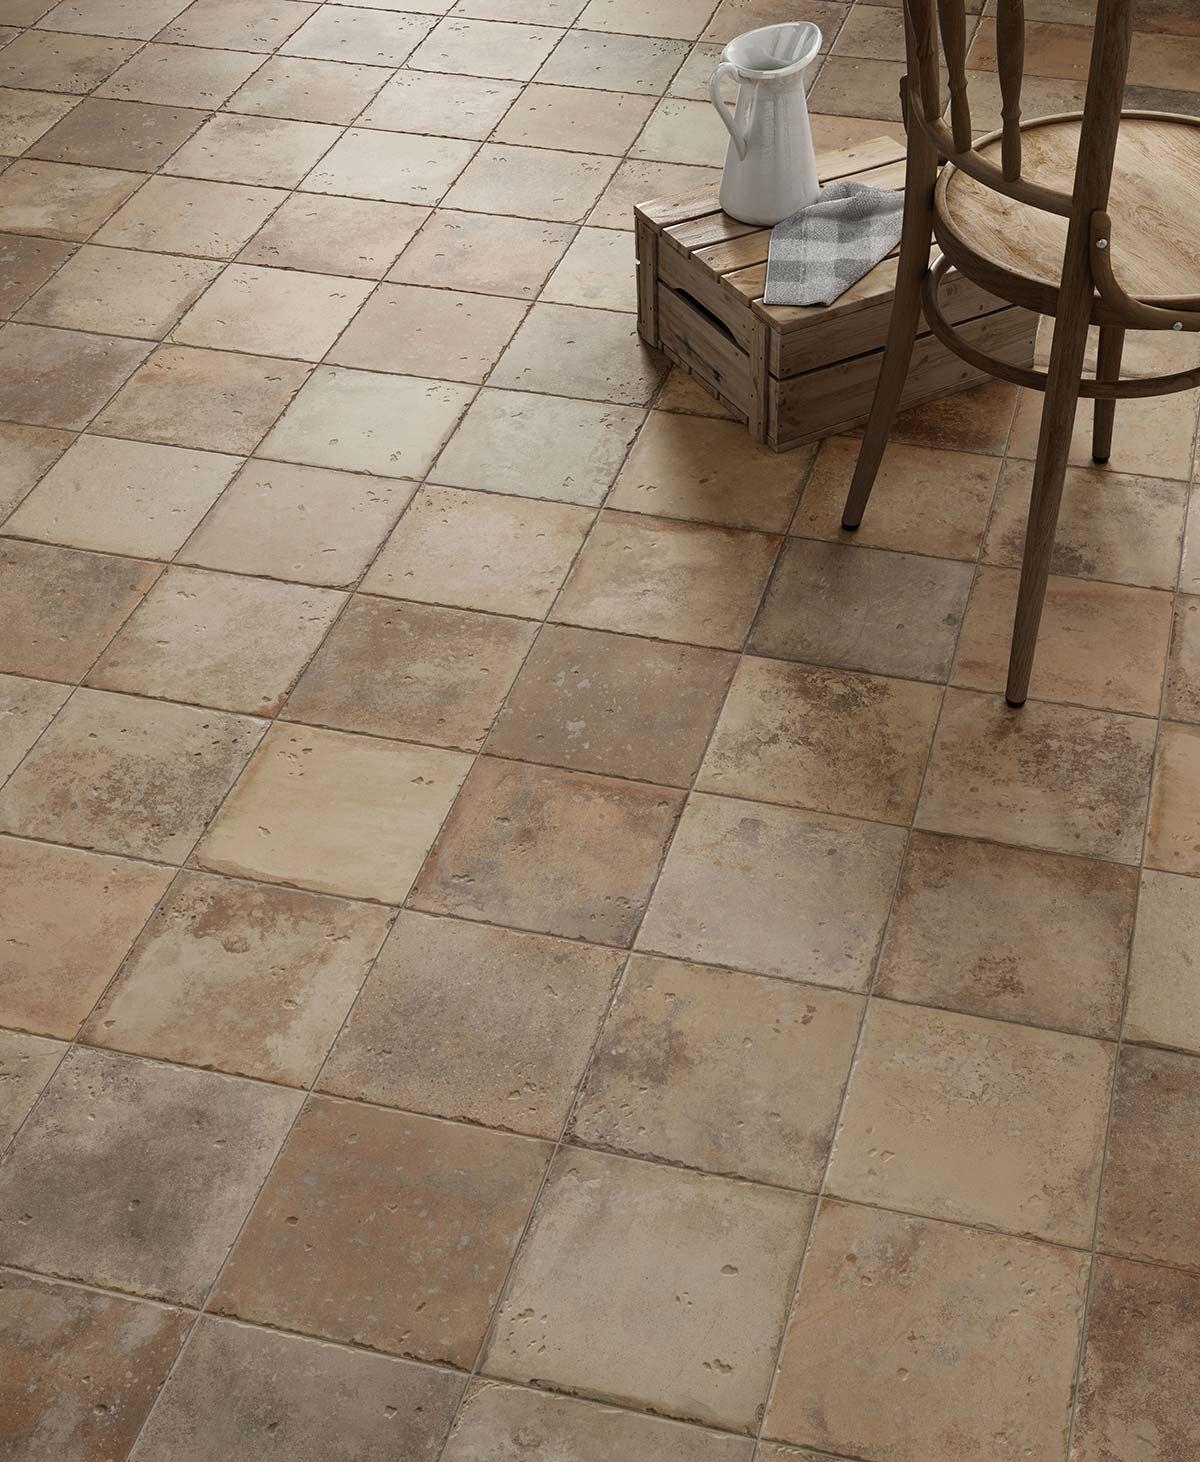 Baldosas de barro cocido fs alora b paviments for Baldosas para exterior